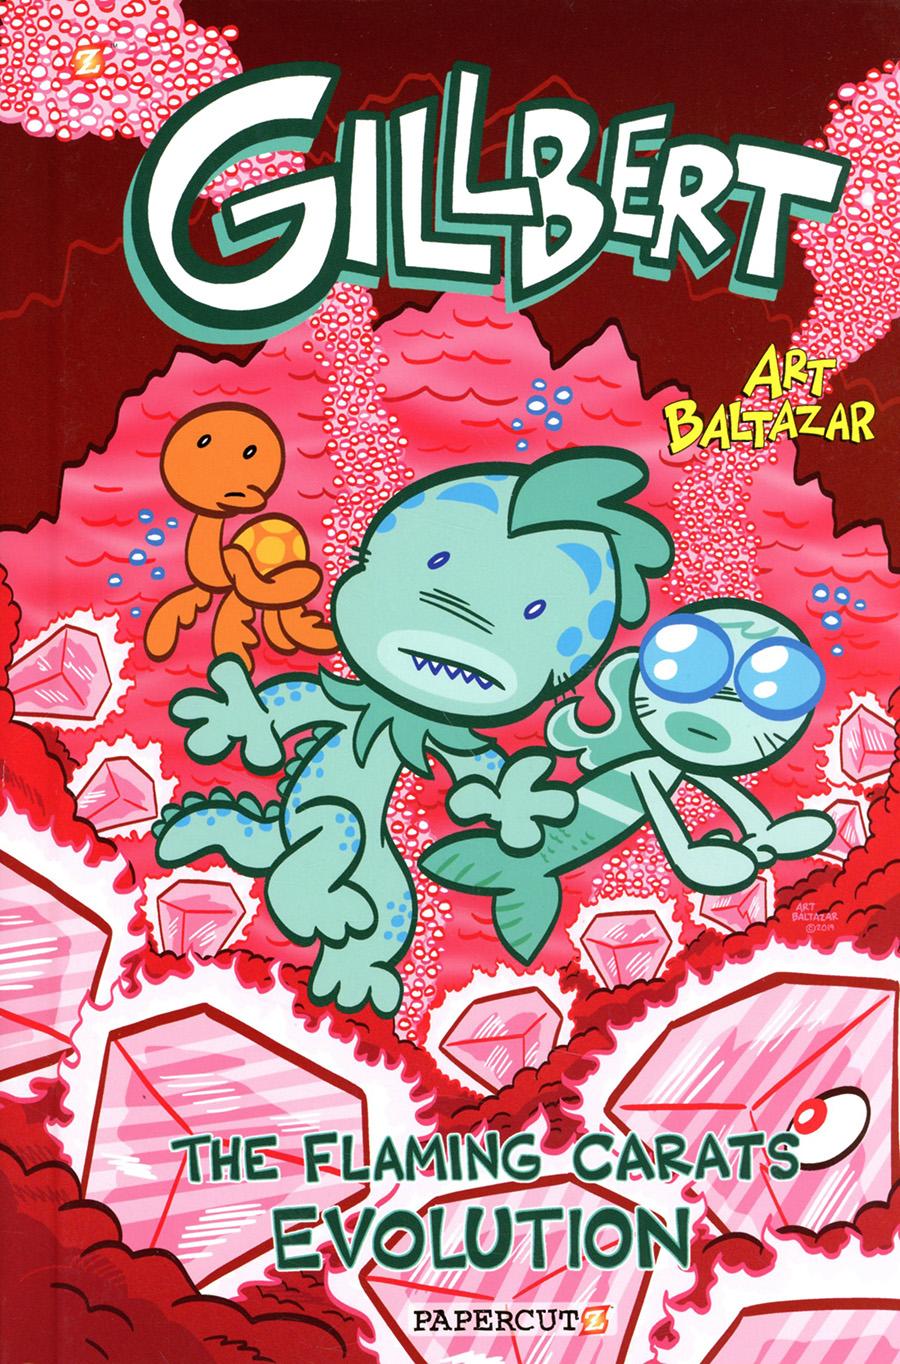 Gillbert The Little Merman Vol 3 Flaming Carats Evolution HC